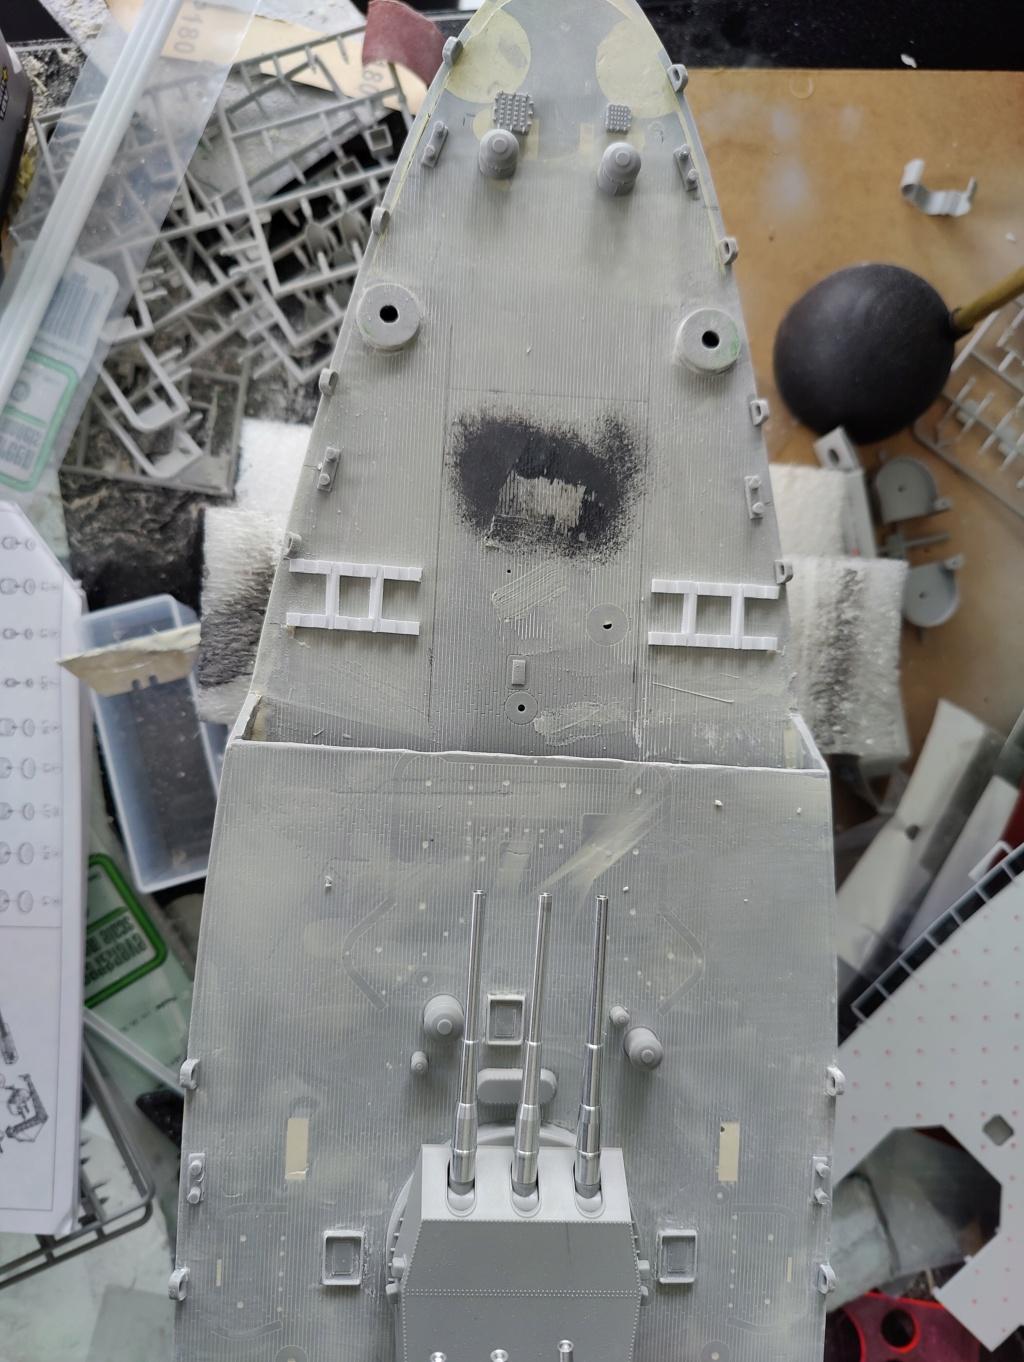 [Uchronie] USS Lake Michigan (sur base Iowa trumpeter 1/200°) par habikitokay - Page 5 Img_2069